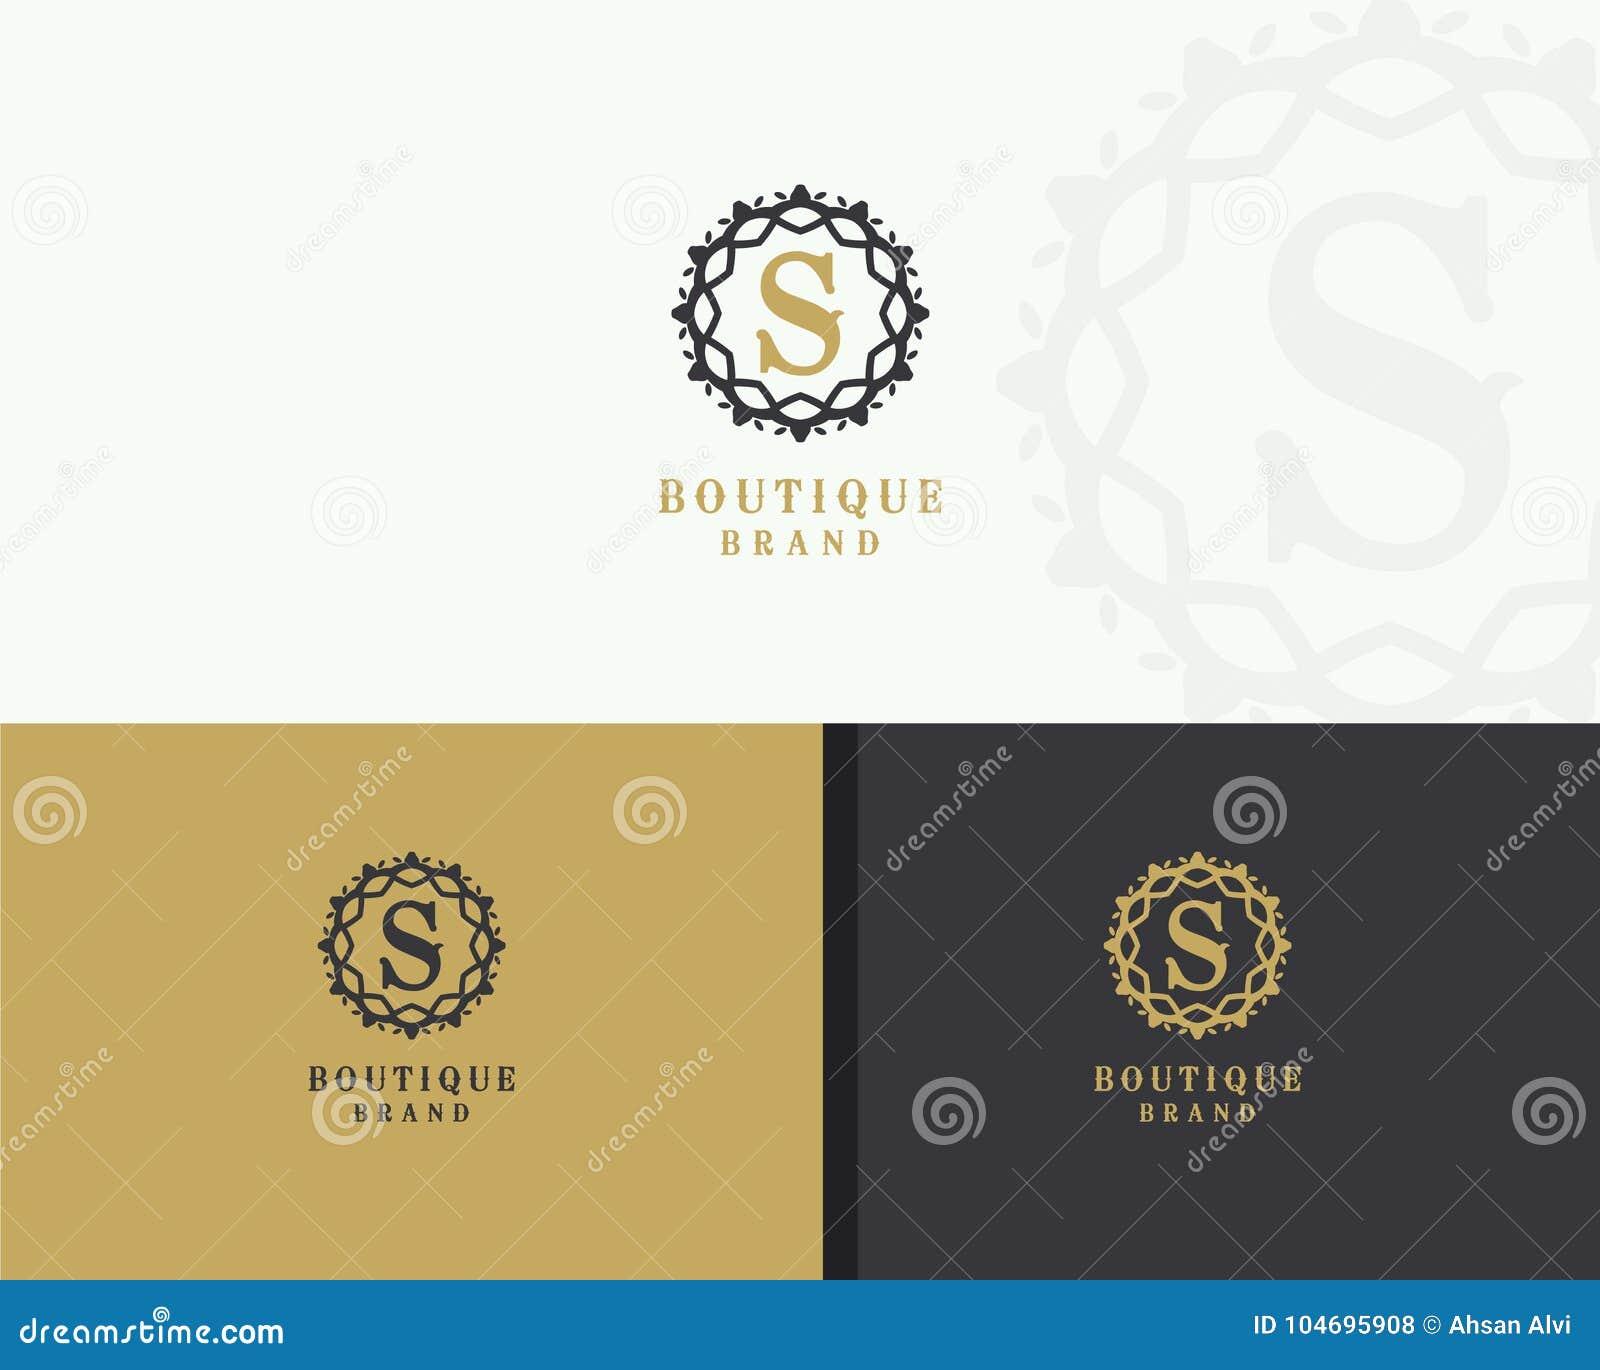 Elegant Ornamental Logo With The Letter S